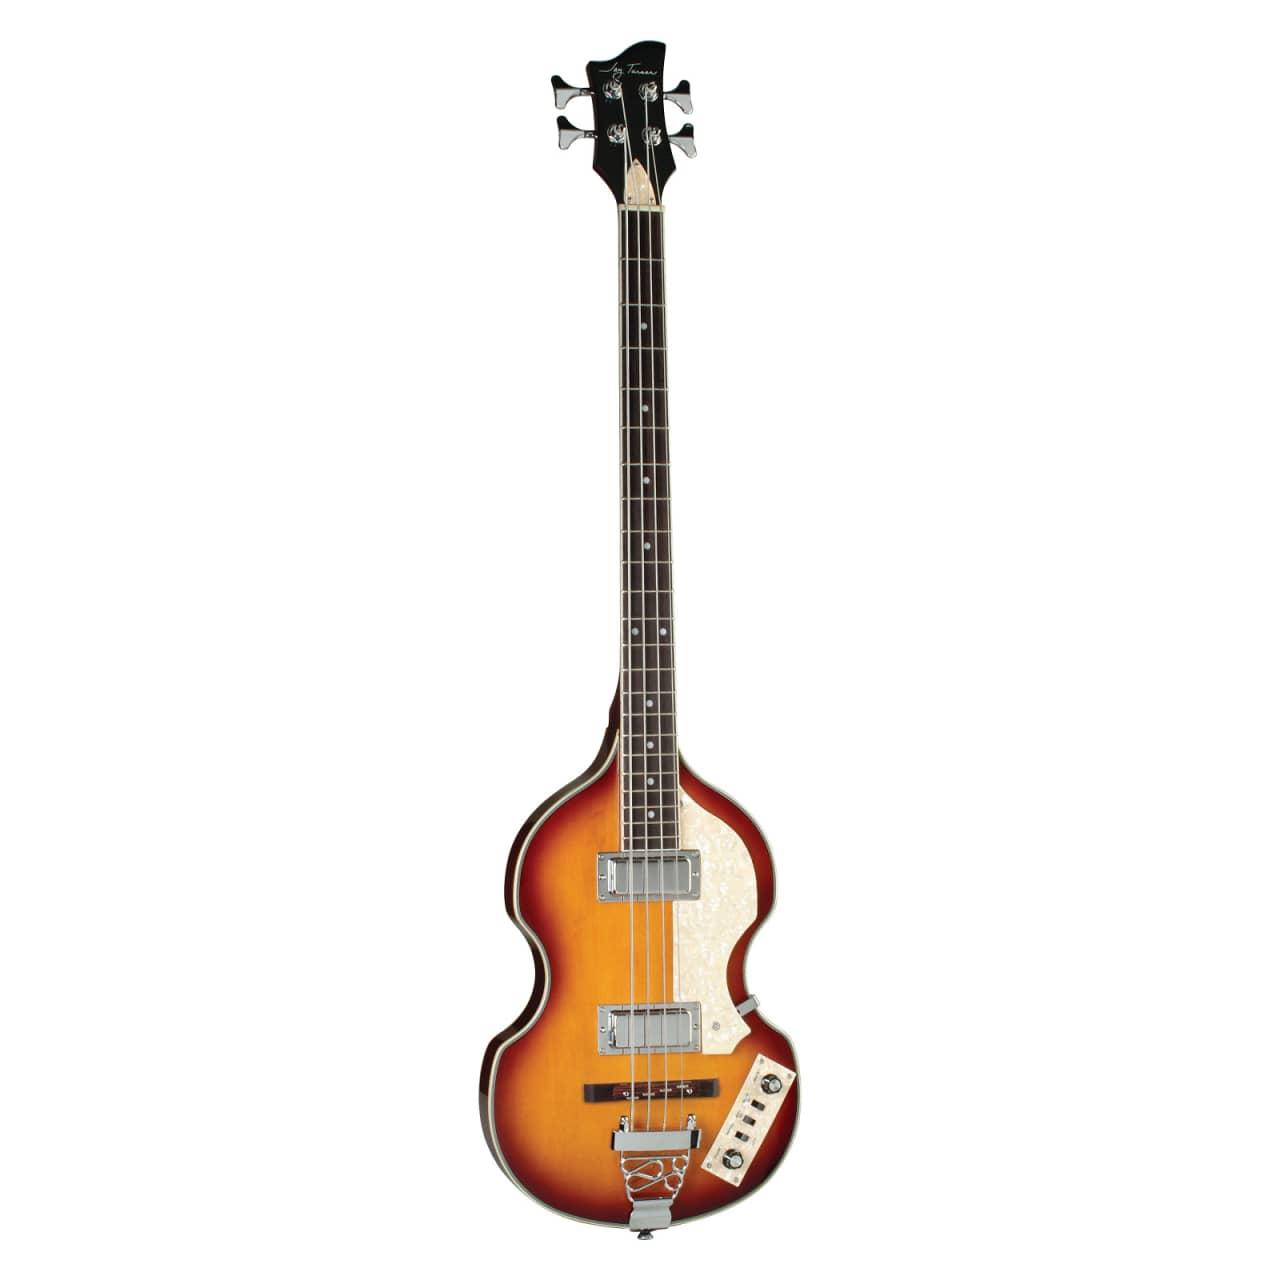 jay turser jtb 2b series electric bass guitar vintage reverb. Black Bedroom Furniture Sets. Home Design Ideas